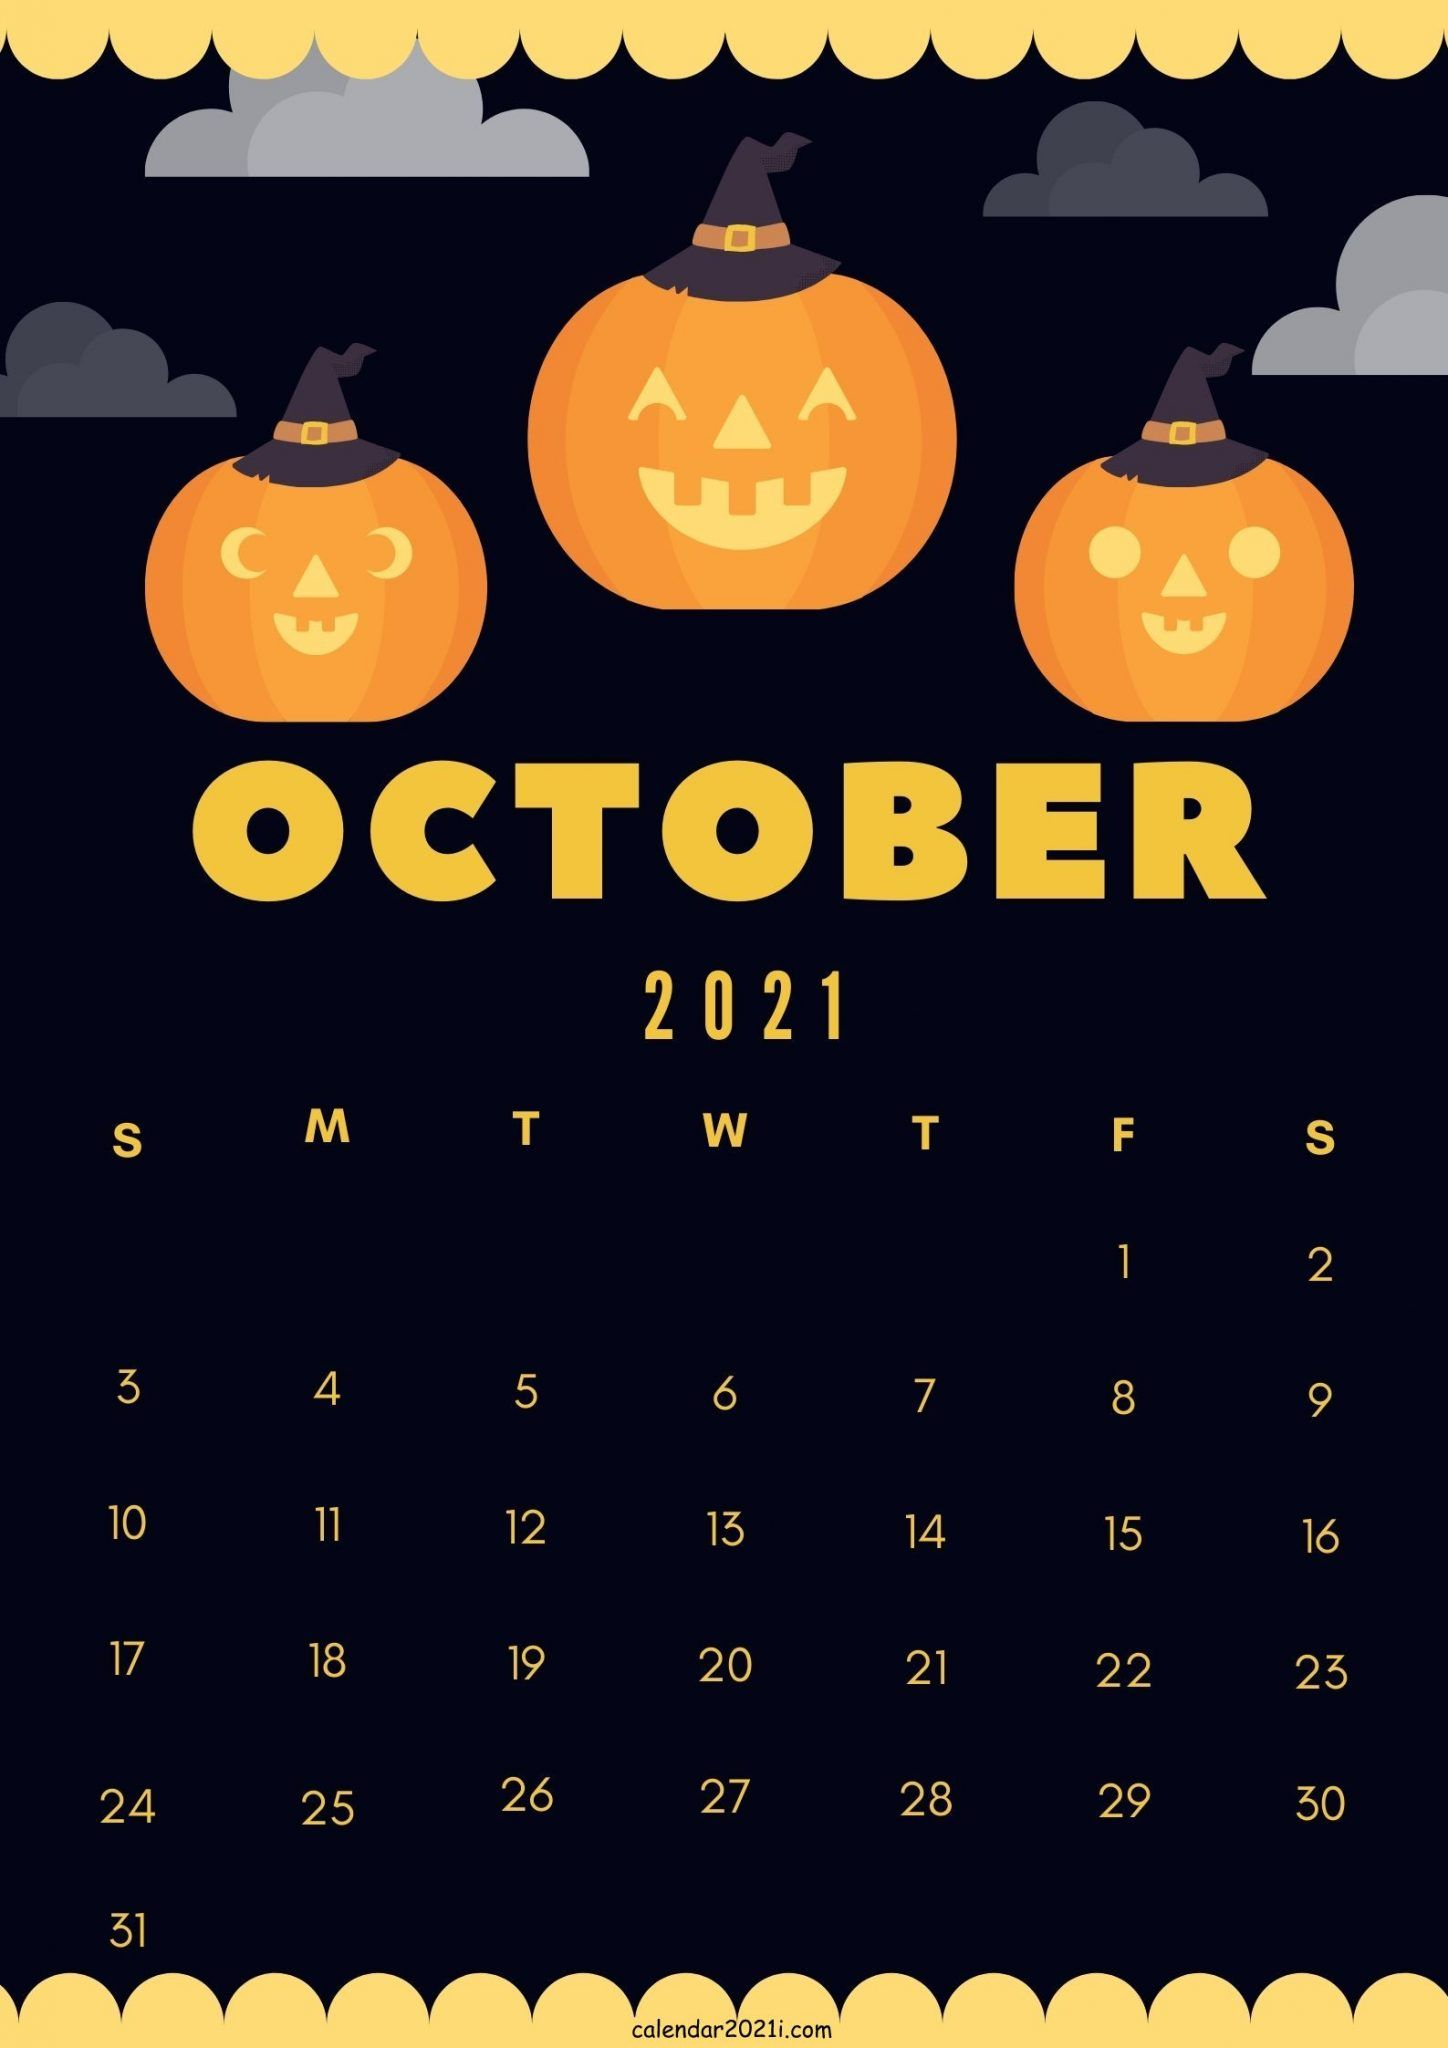 Cute October 2021 Calendar October 2021 Cute Calendar Design | Calendar design, Free